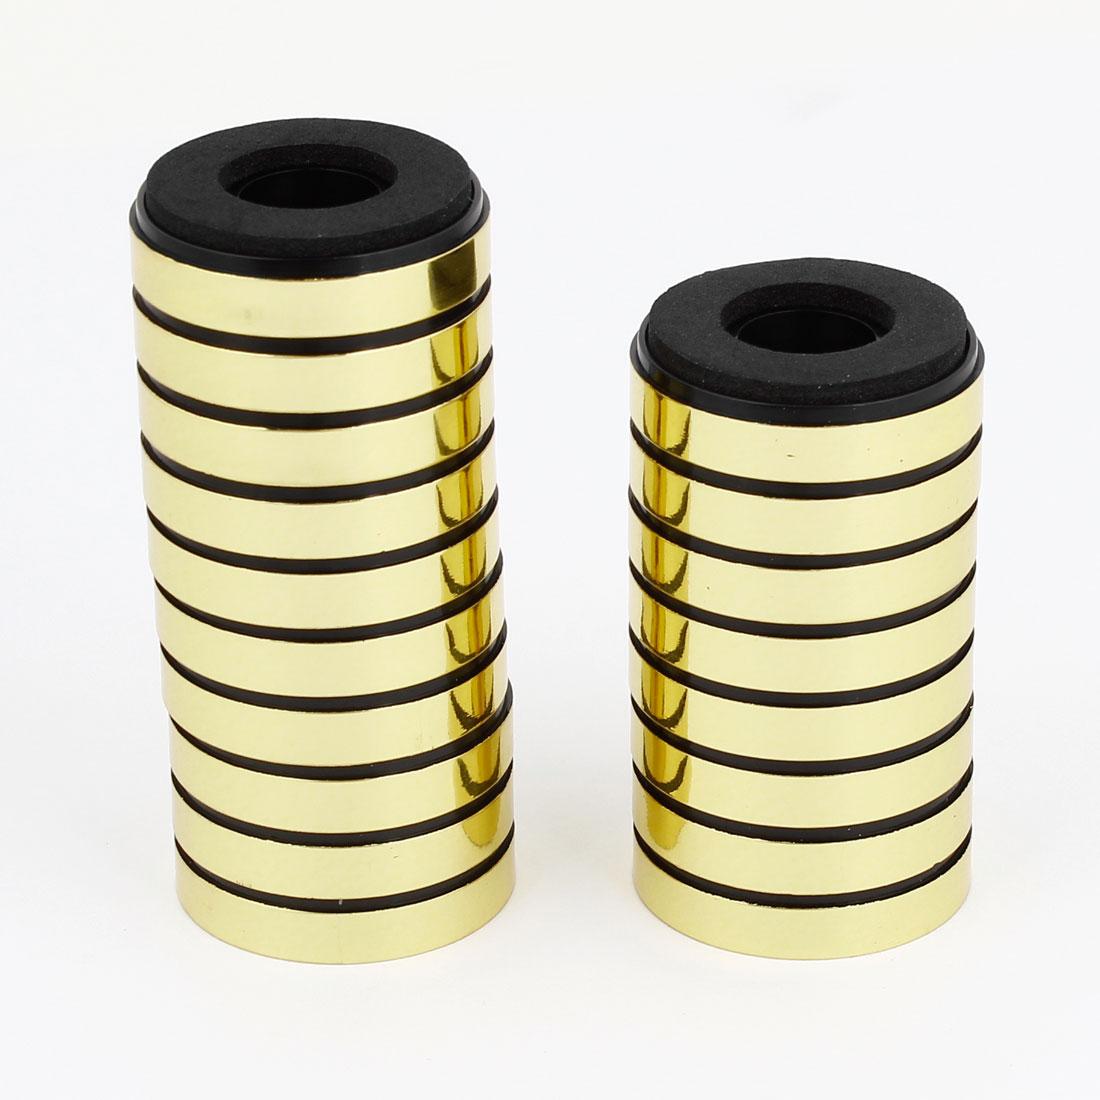 20PCS 4.5mm Mount Hole Speaker Ammeter Amplifier Feet Pad Stand 30mmx8.5mm